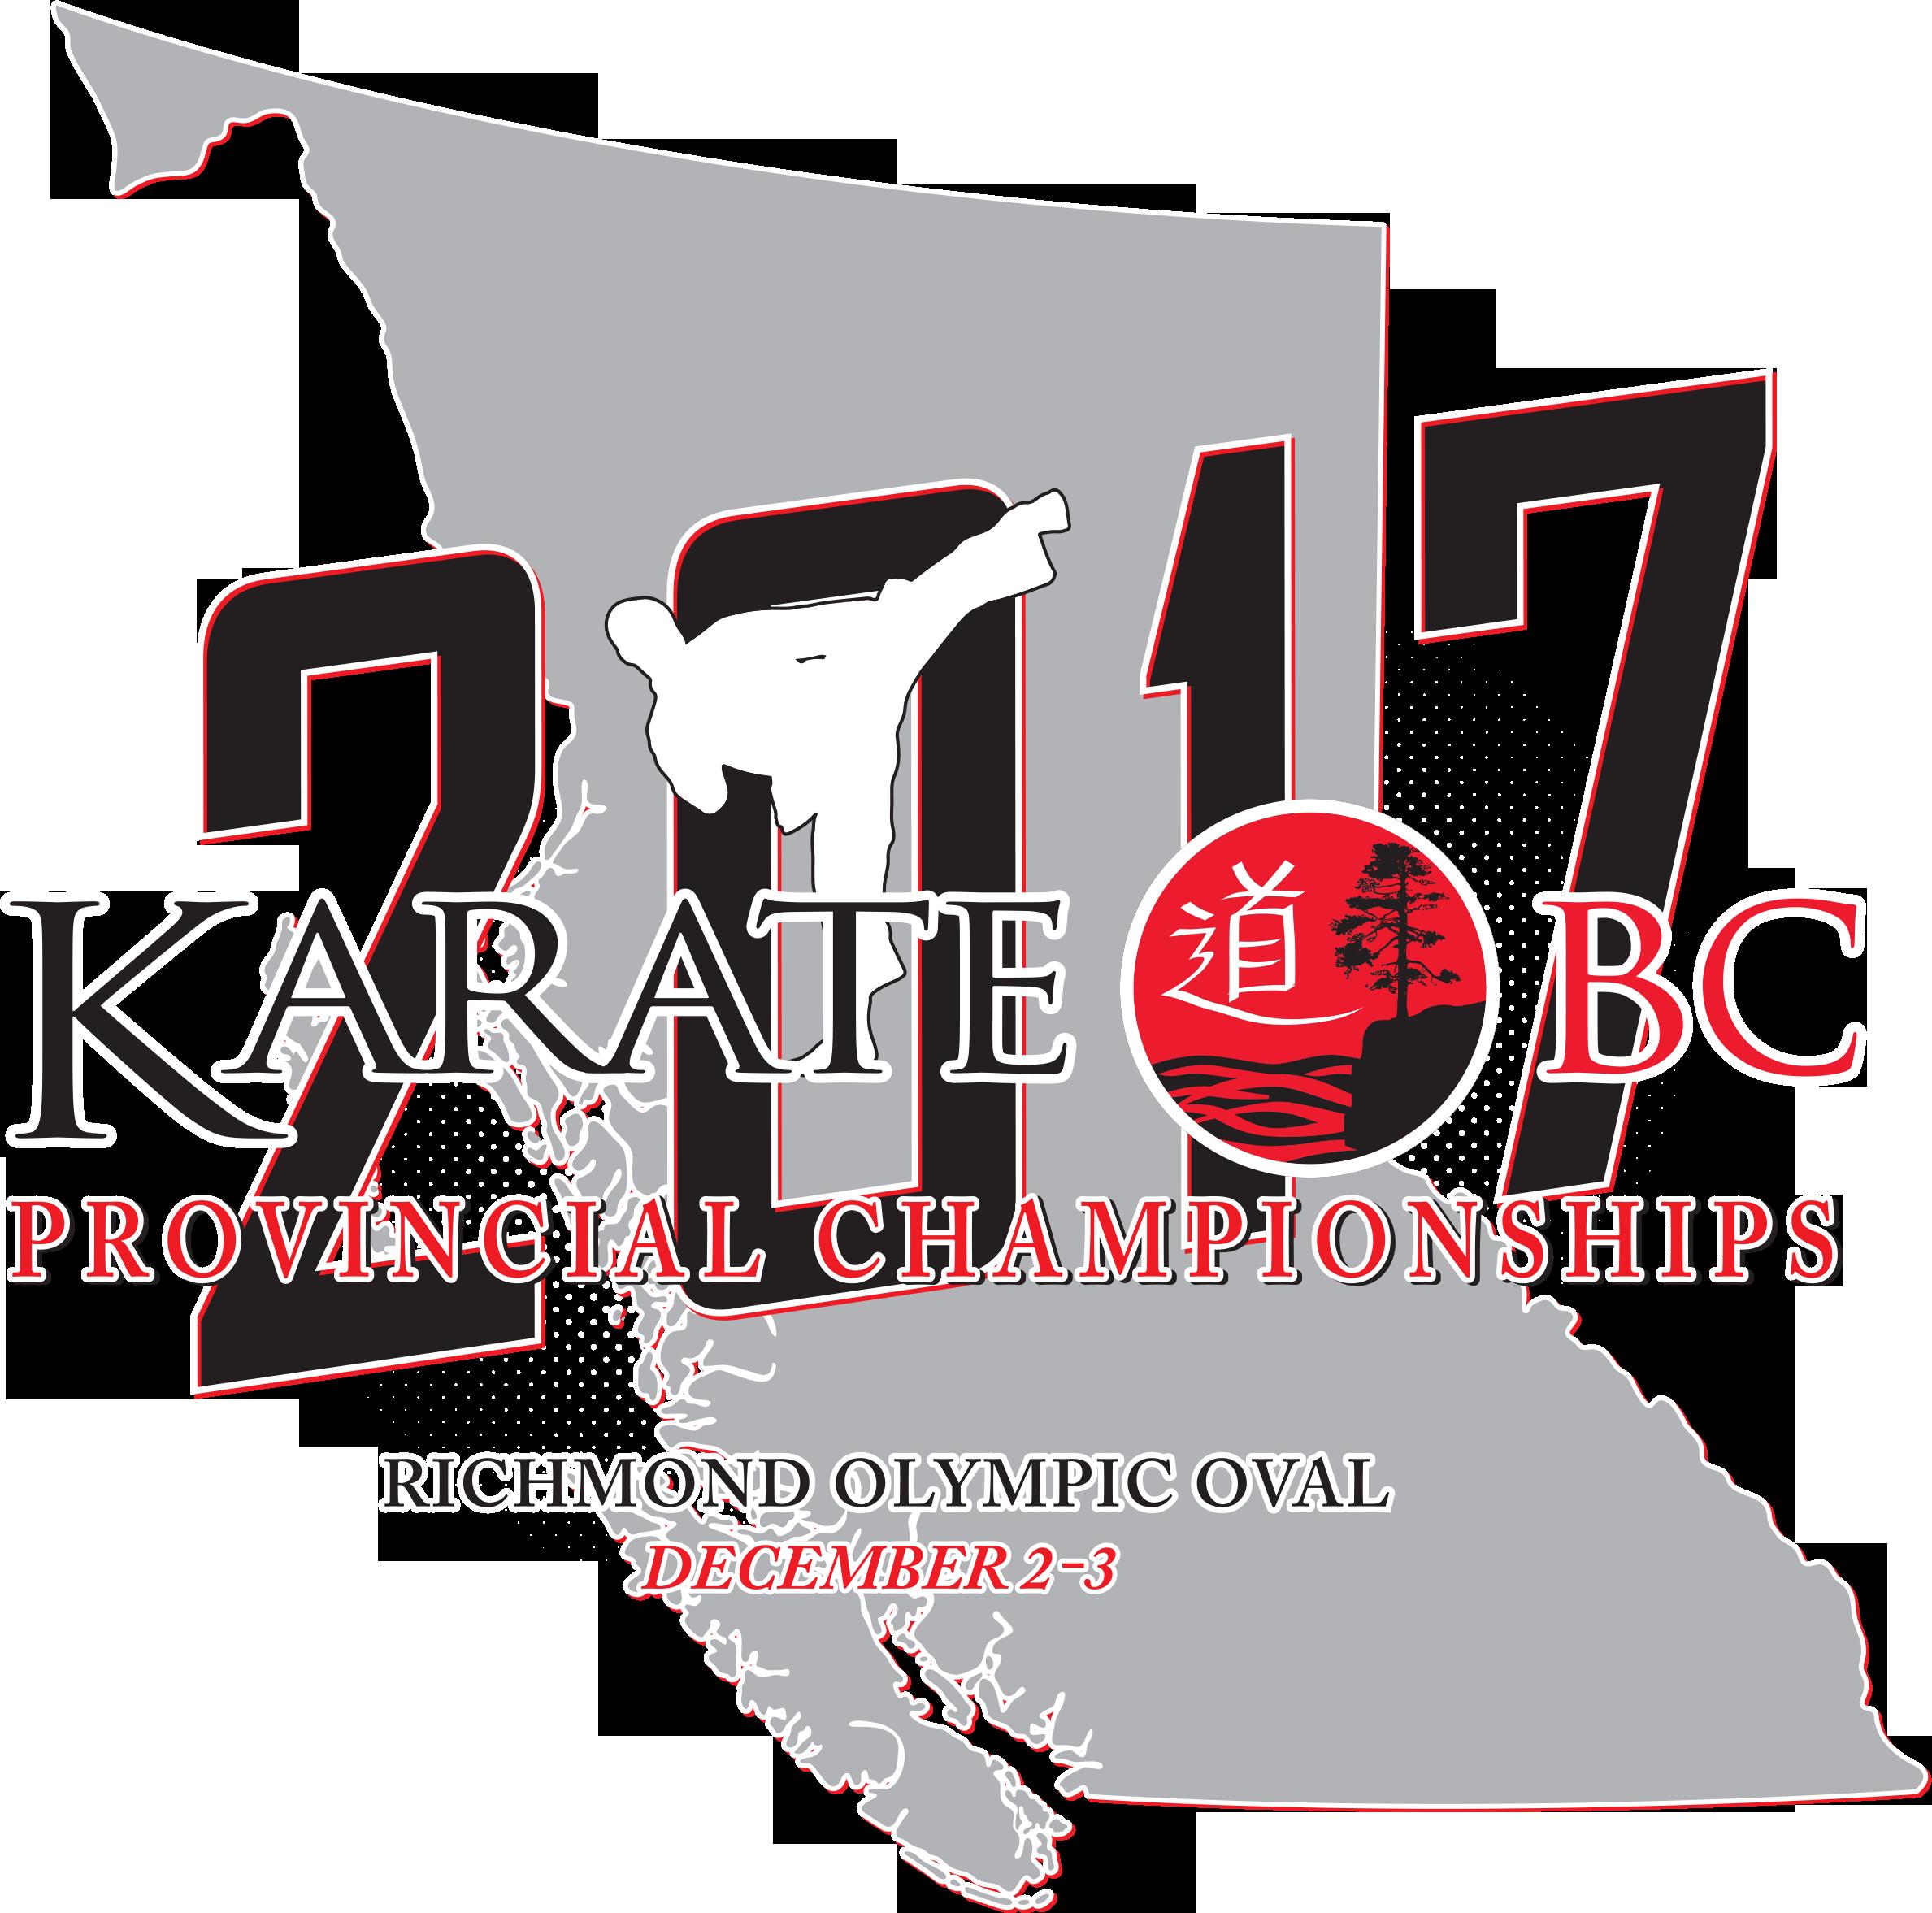 2017 Karate BC Provincial Championships